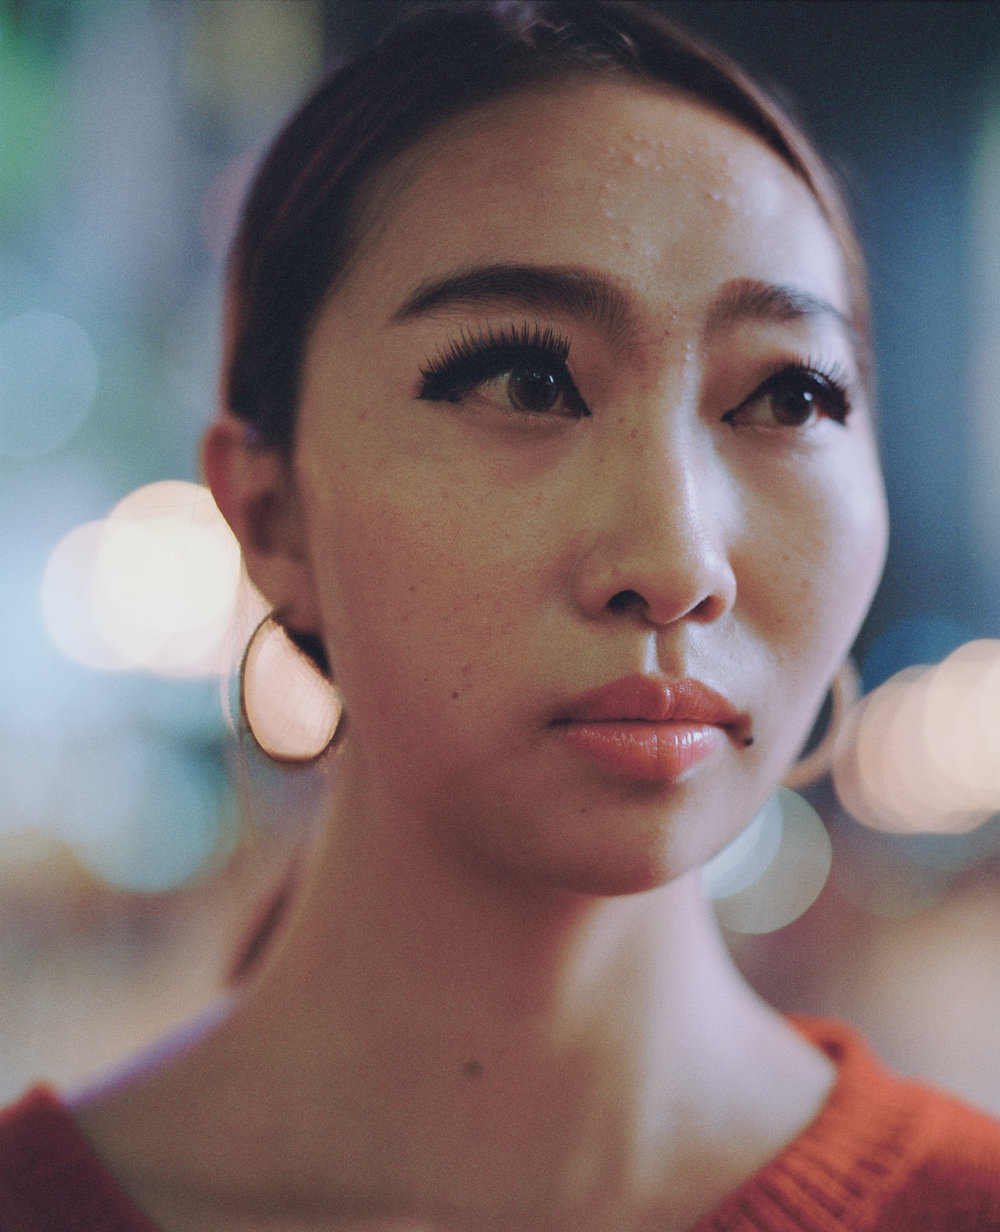 Teresa Eng - XING - Elizabeth Gabrielle Lee - Photobook Challenges Sexualization on Asian Women.jpg